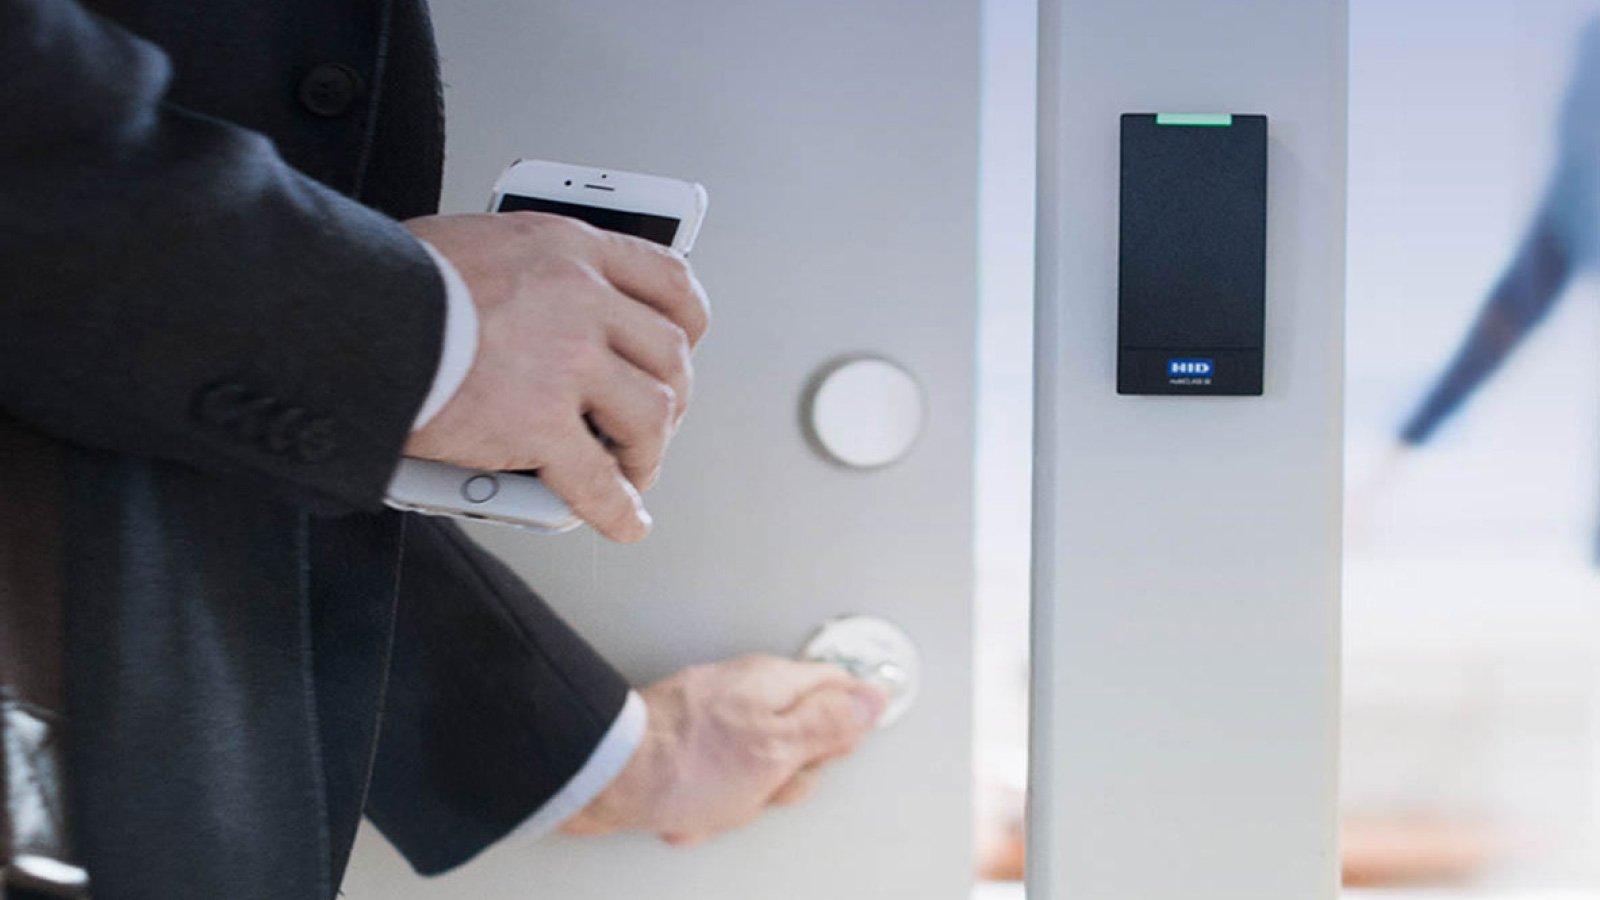 Mobile Access Phone Unlocks HID Reader on Door